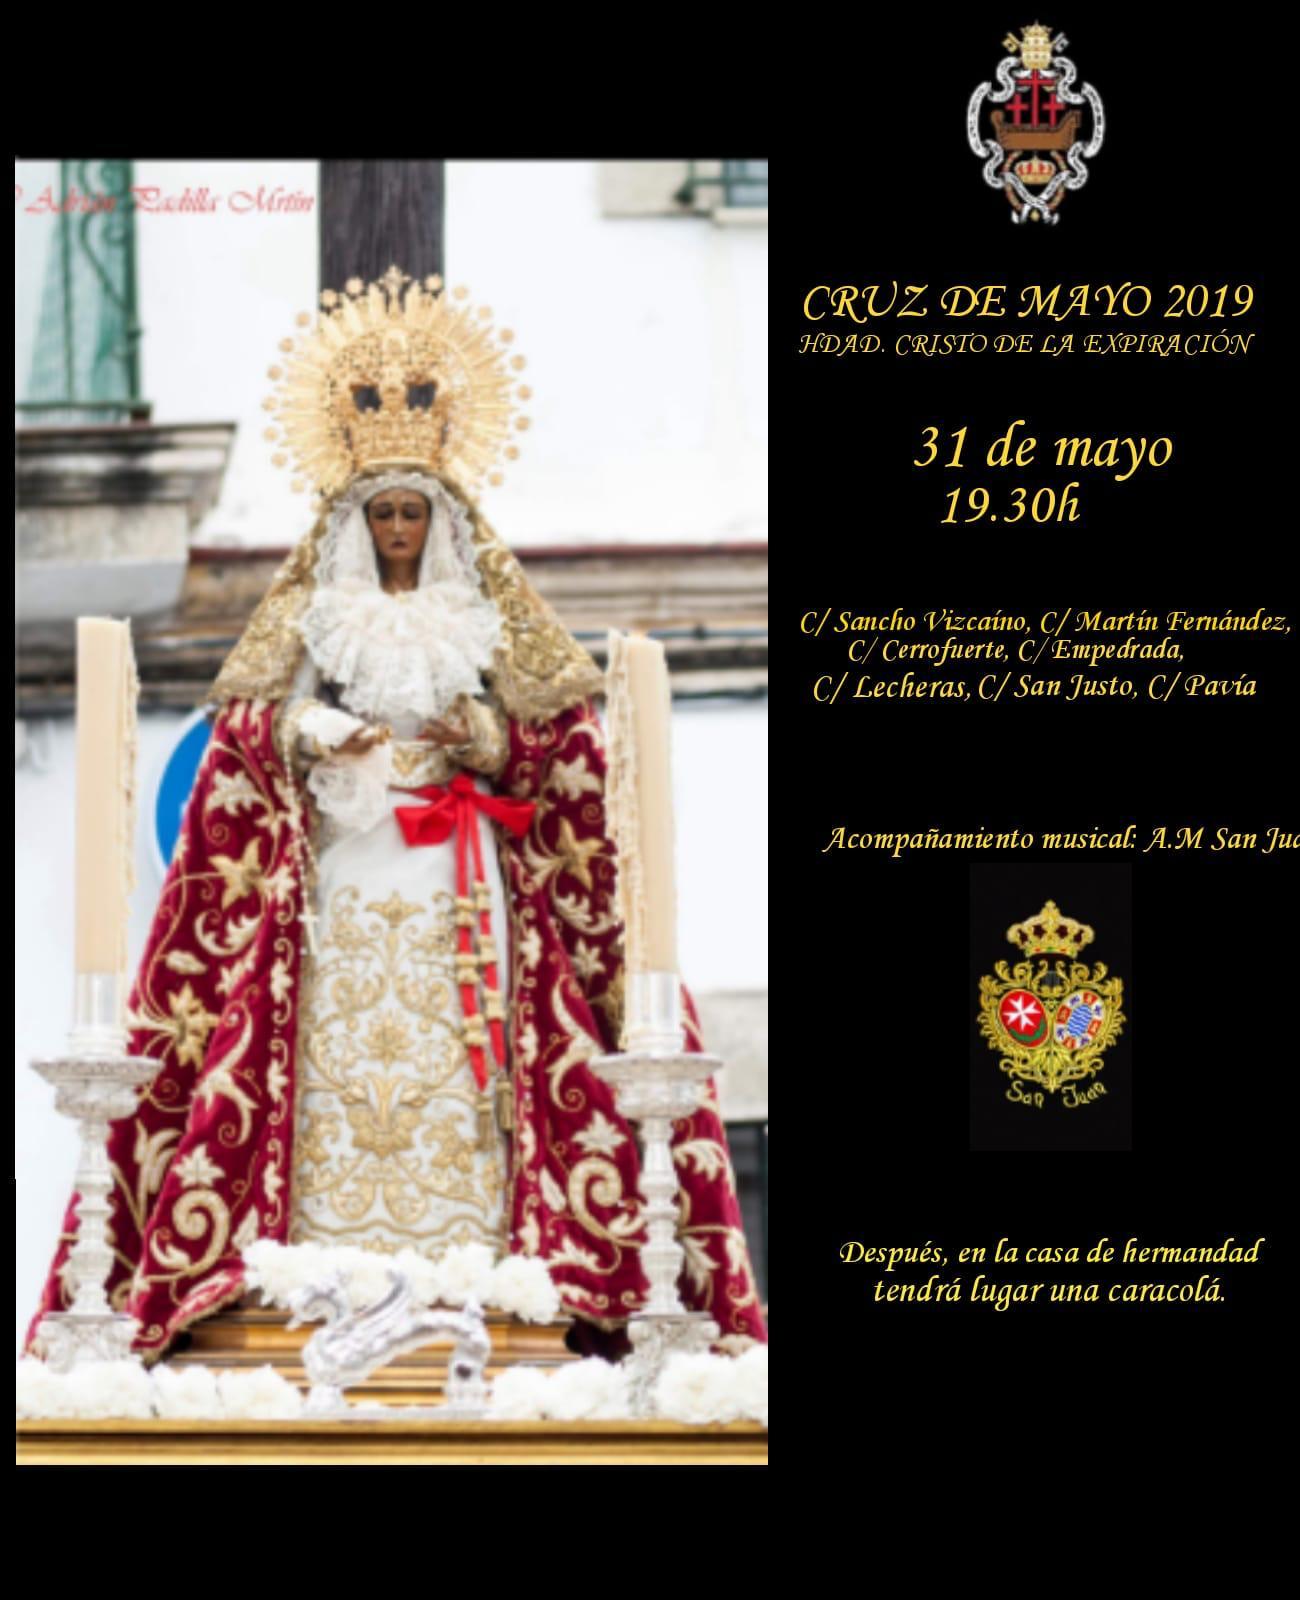 Cruz de Mayo 2019